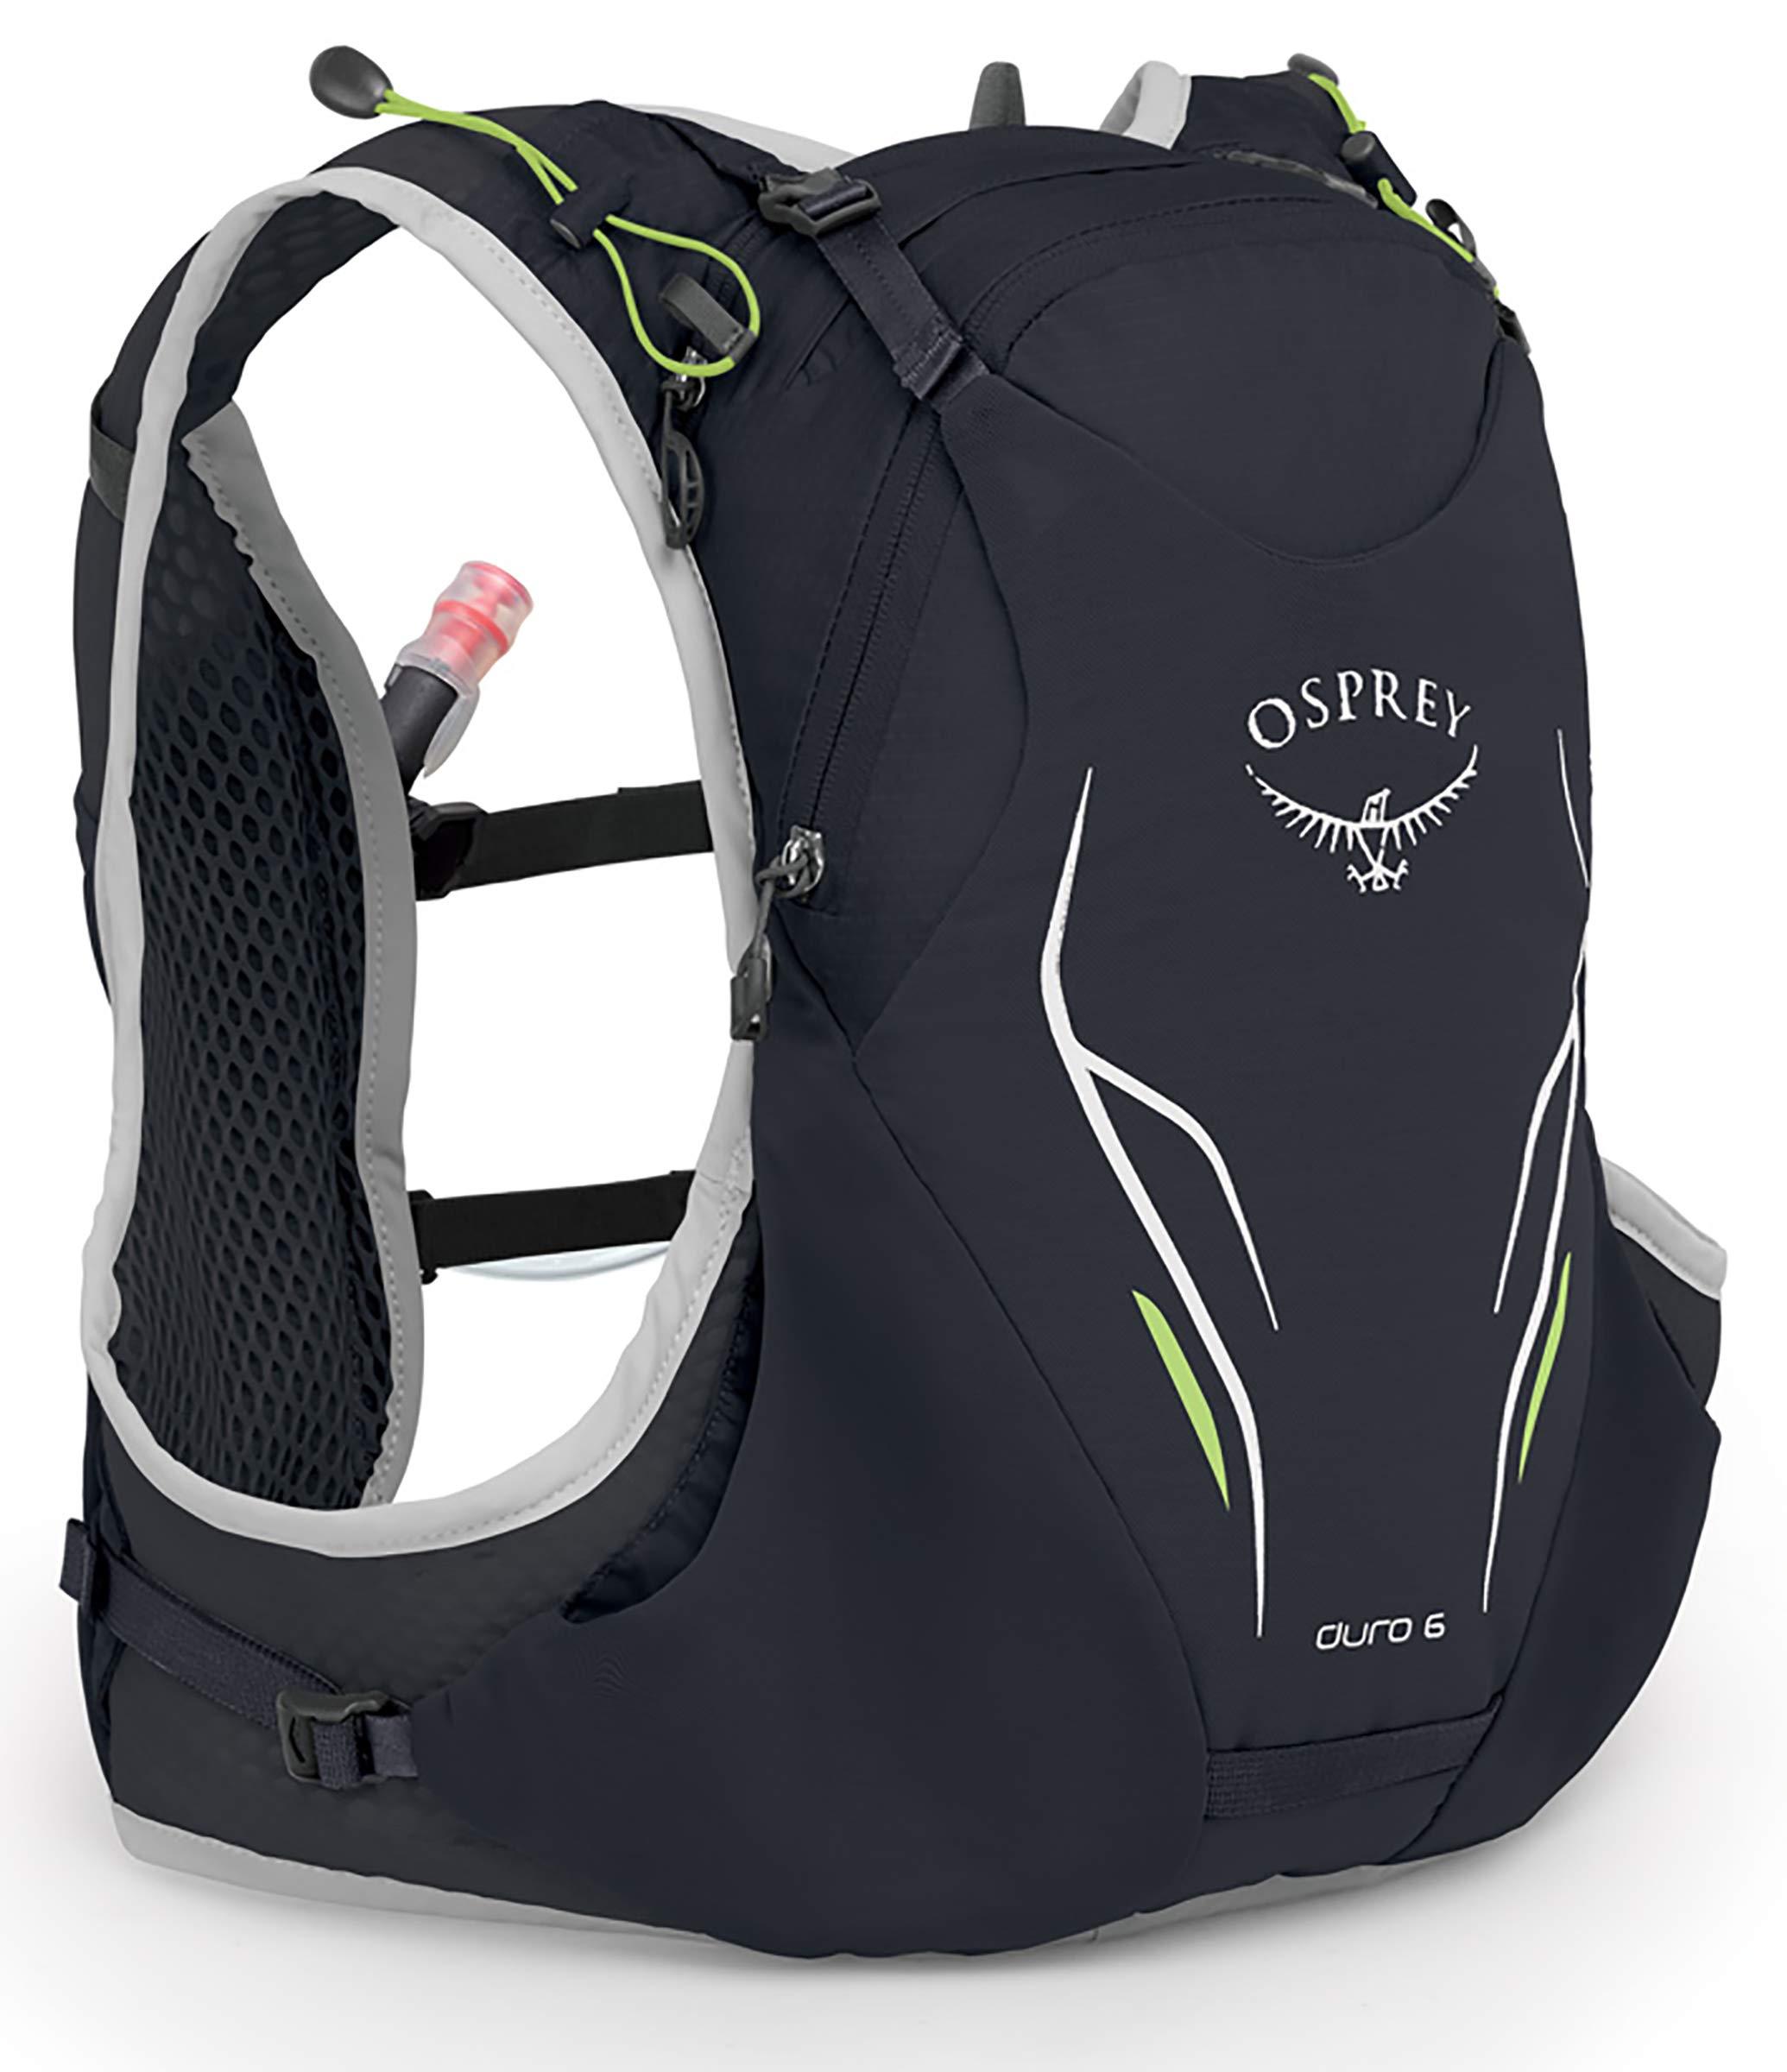 Osprey Packs Duro 6 Running Hydration Vest, Alpine Black, Medium/Large by Osprey (Image #1)